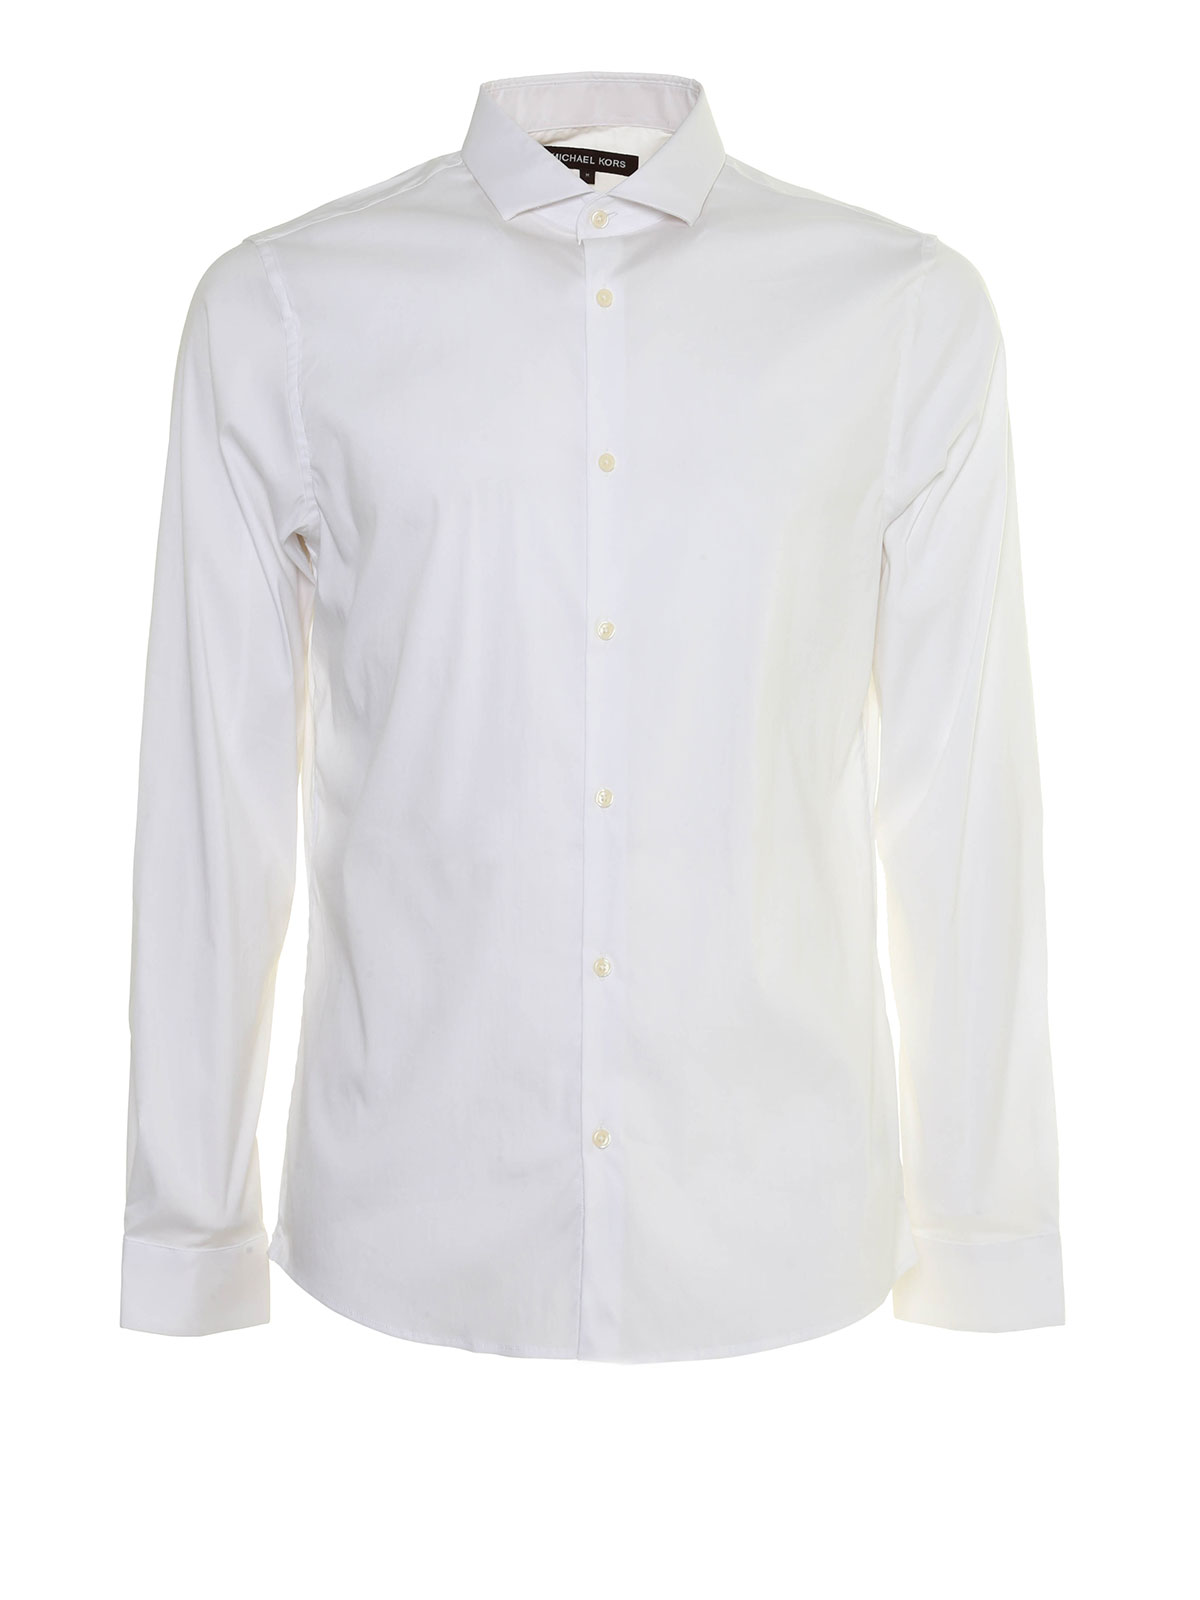 Slim fit cotton blend shirt by michael kors shirts ikrix for Slim fit cotton shirts